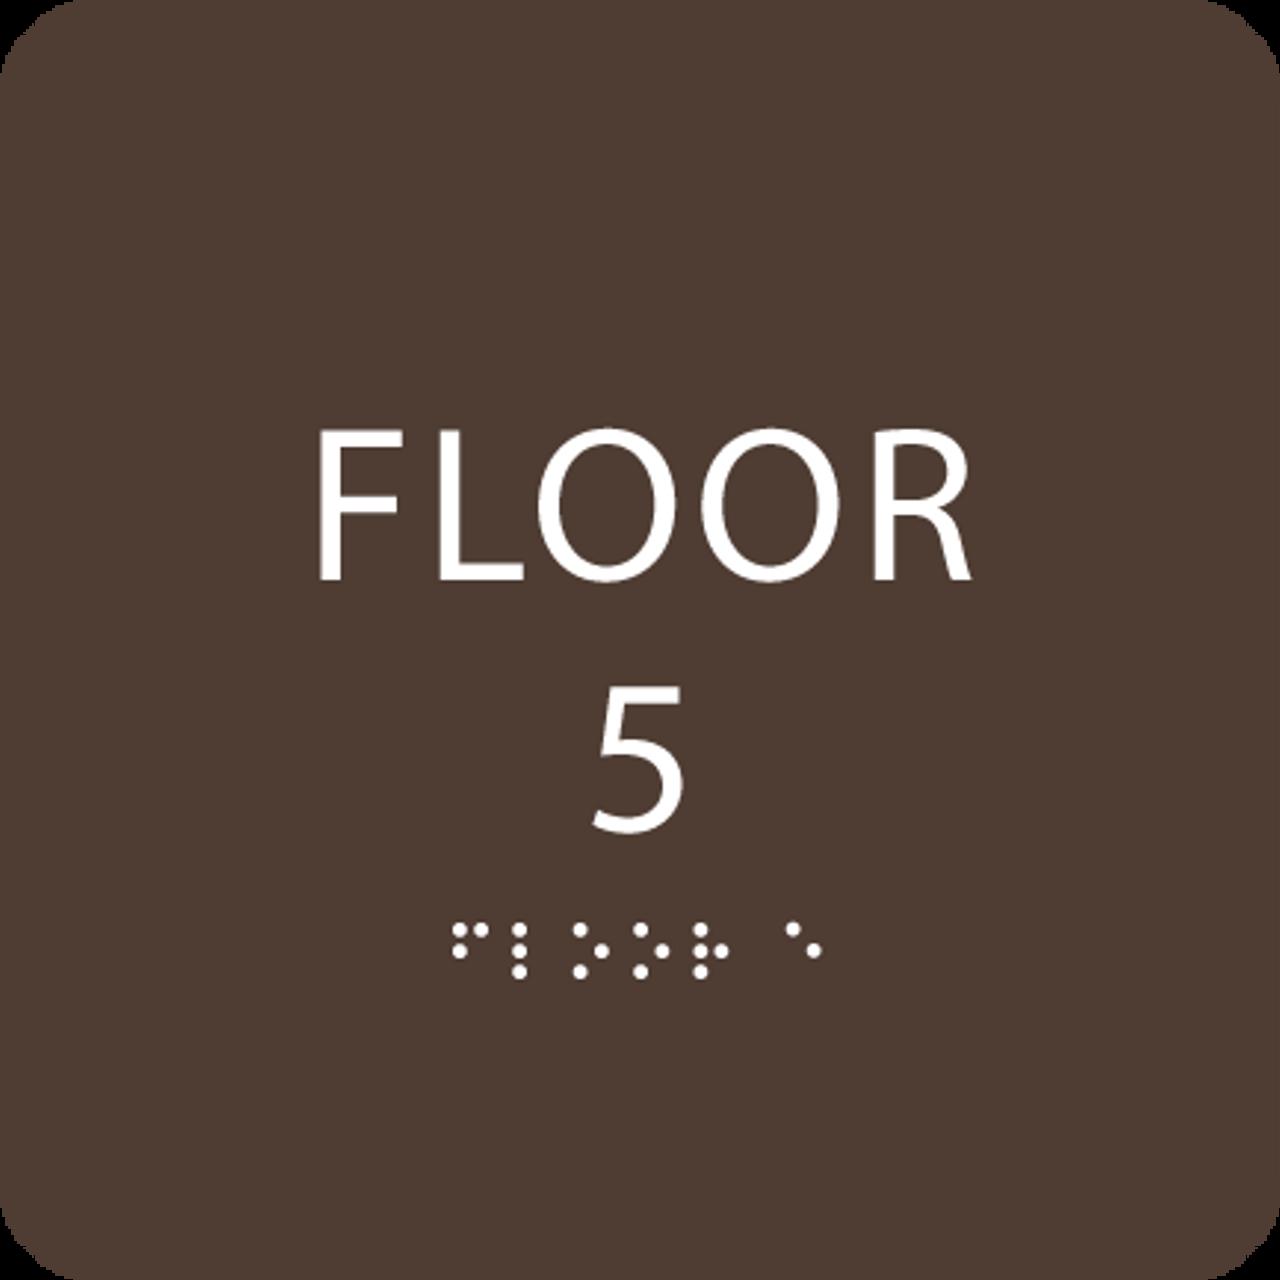 Dark Brown Floor 5 Level Identification Sign